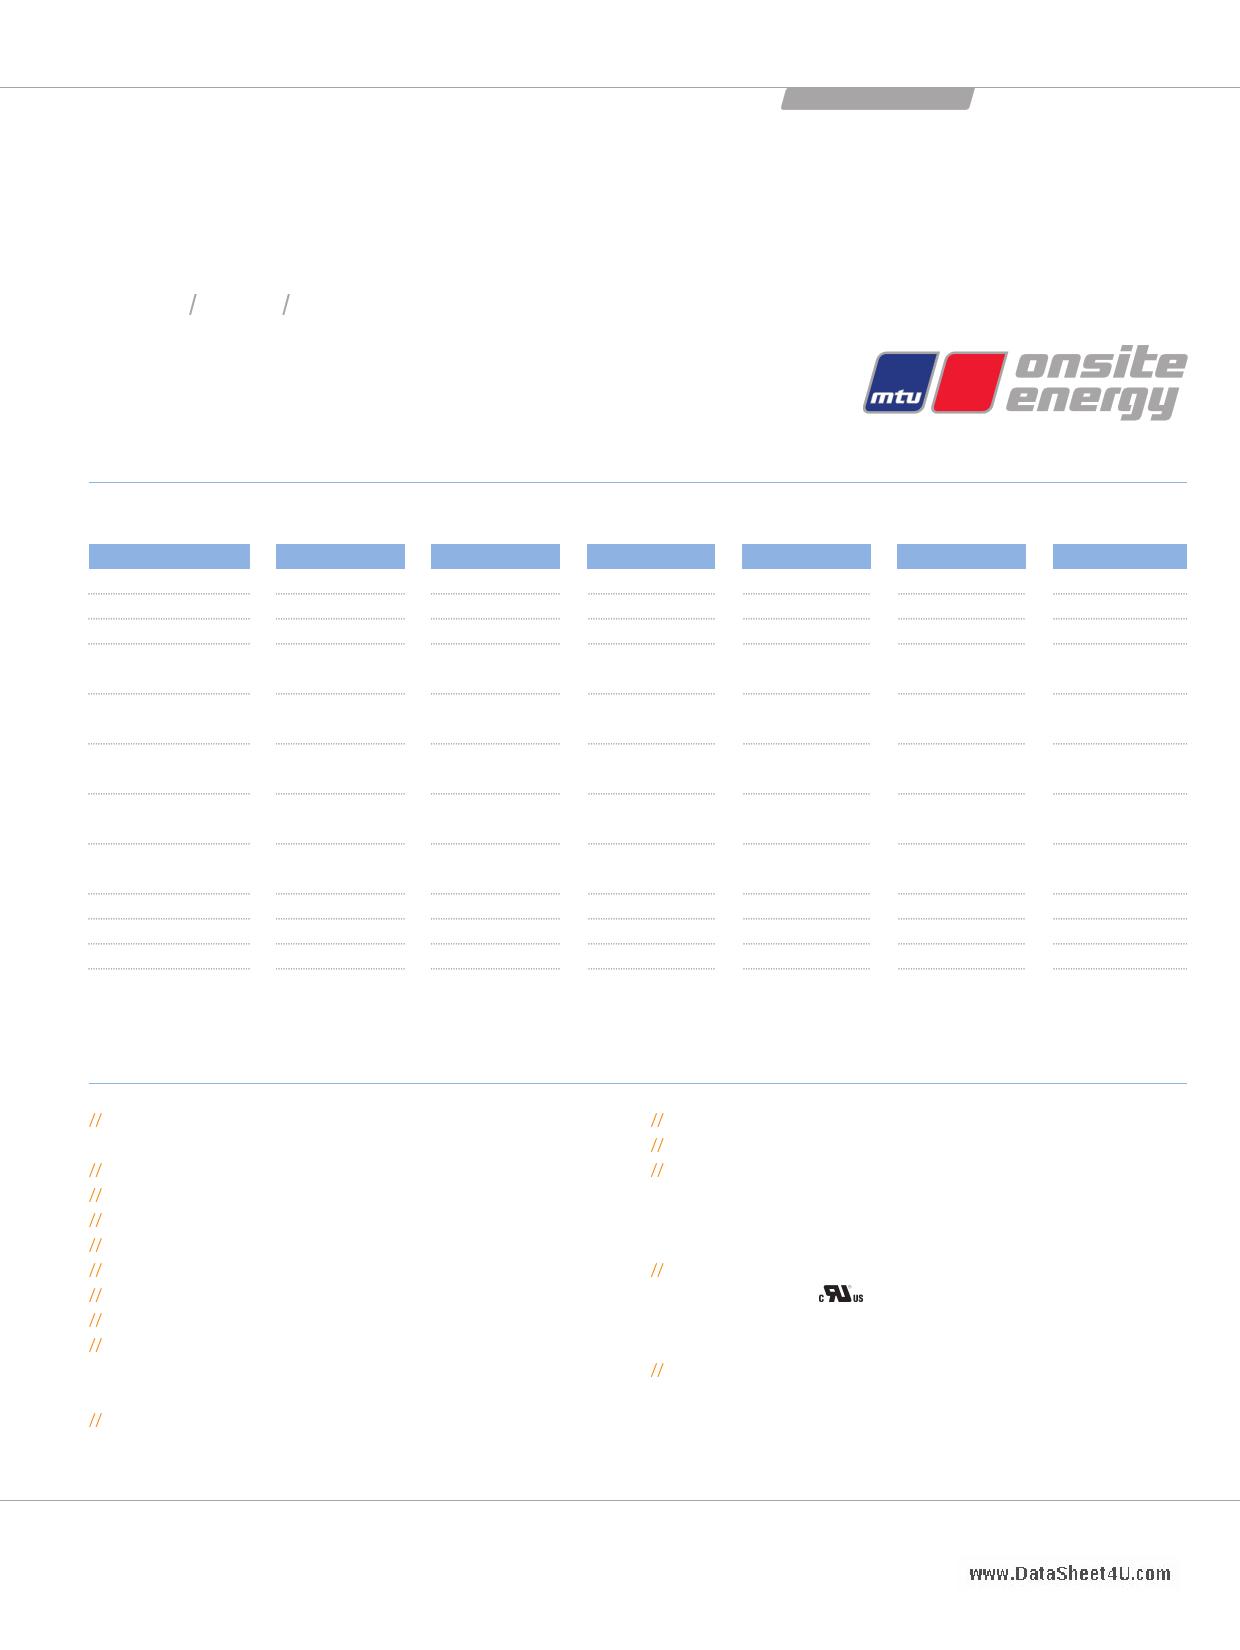 80-GC6NLT1 datasheet